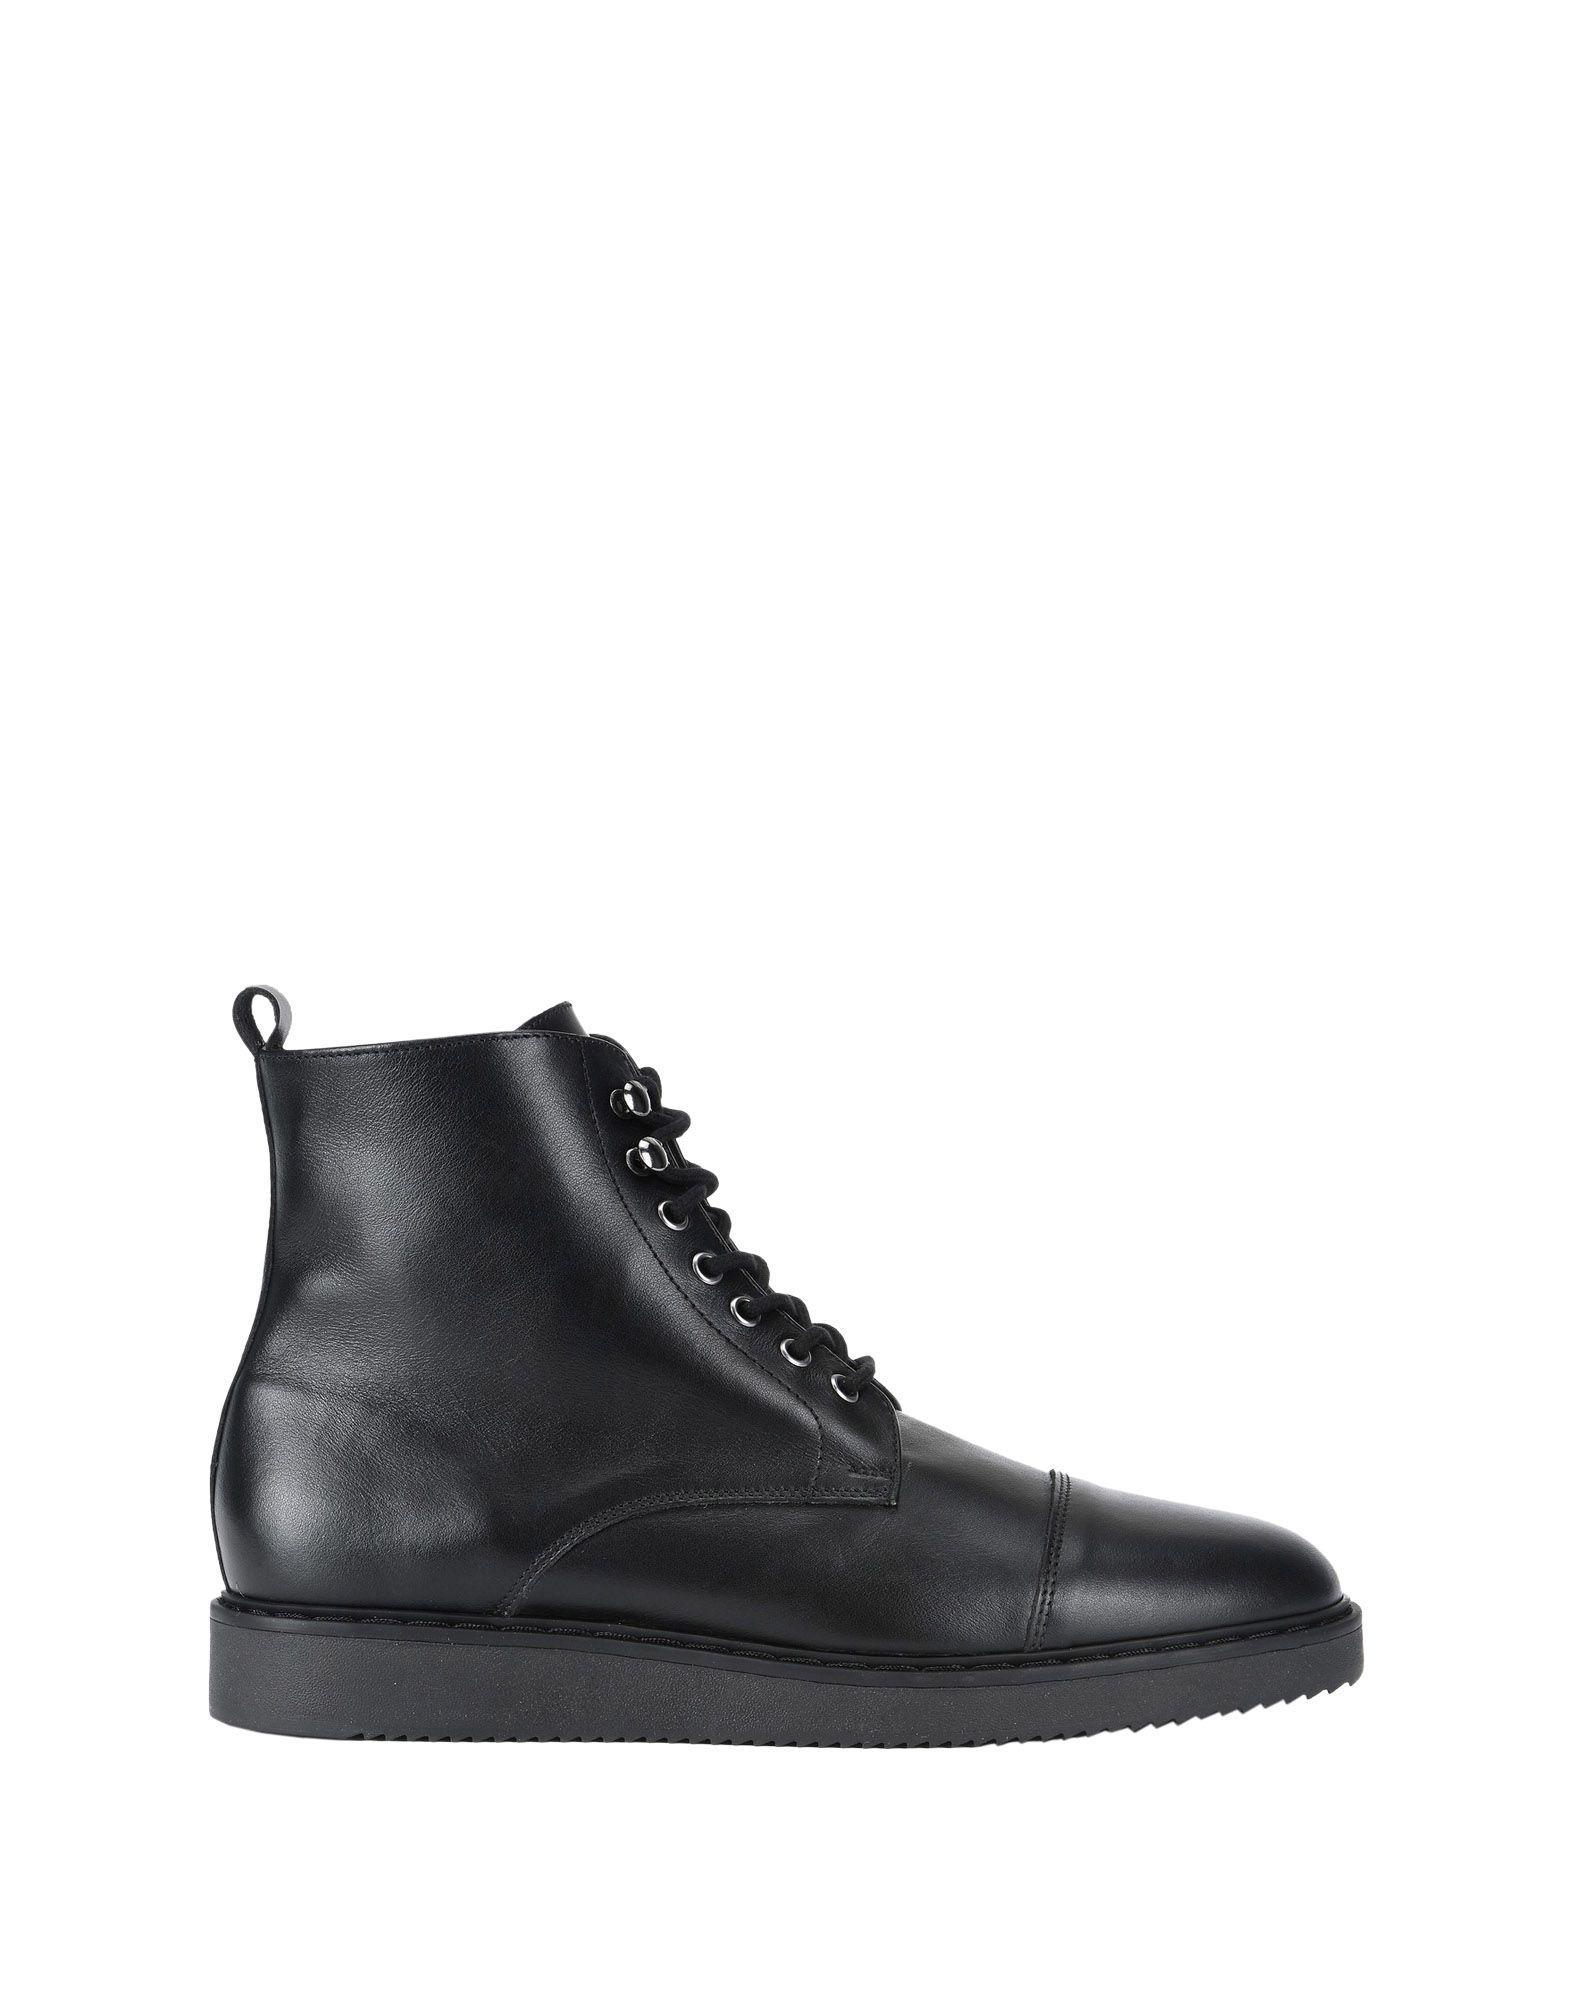 Ylati Heritage Stiefelette Herren  11483161GD Neue Schuhe